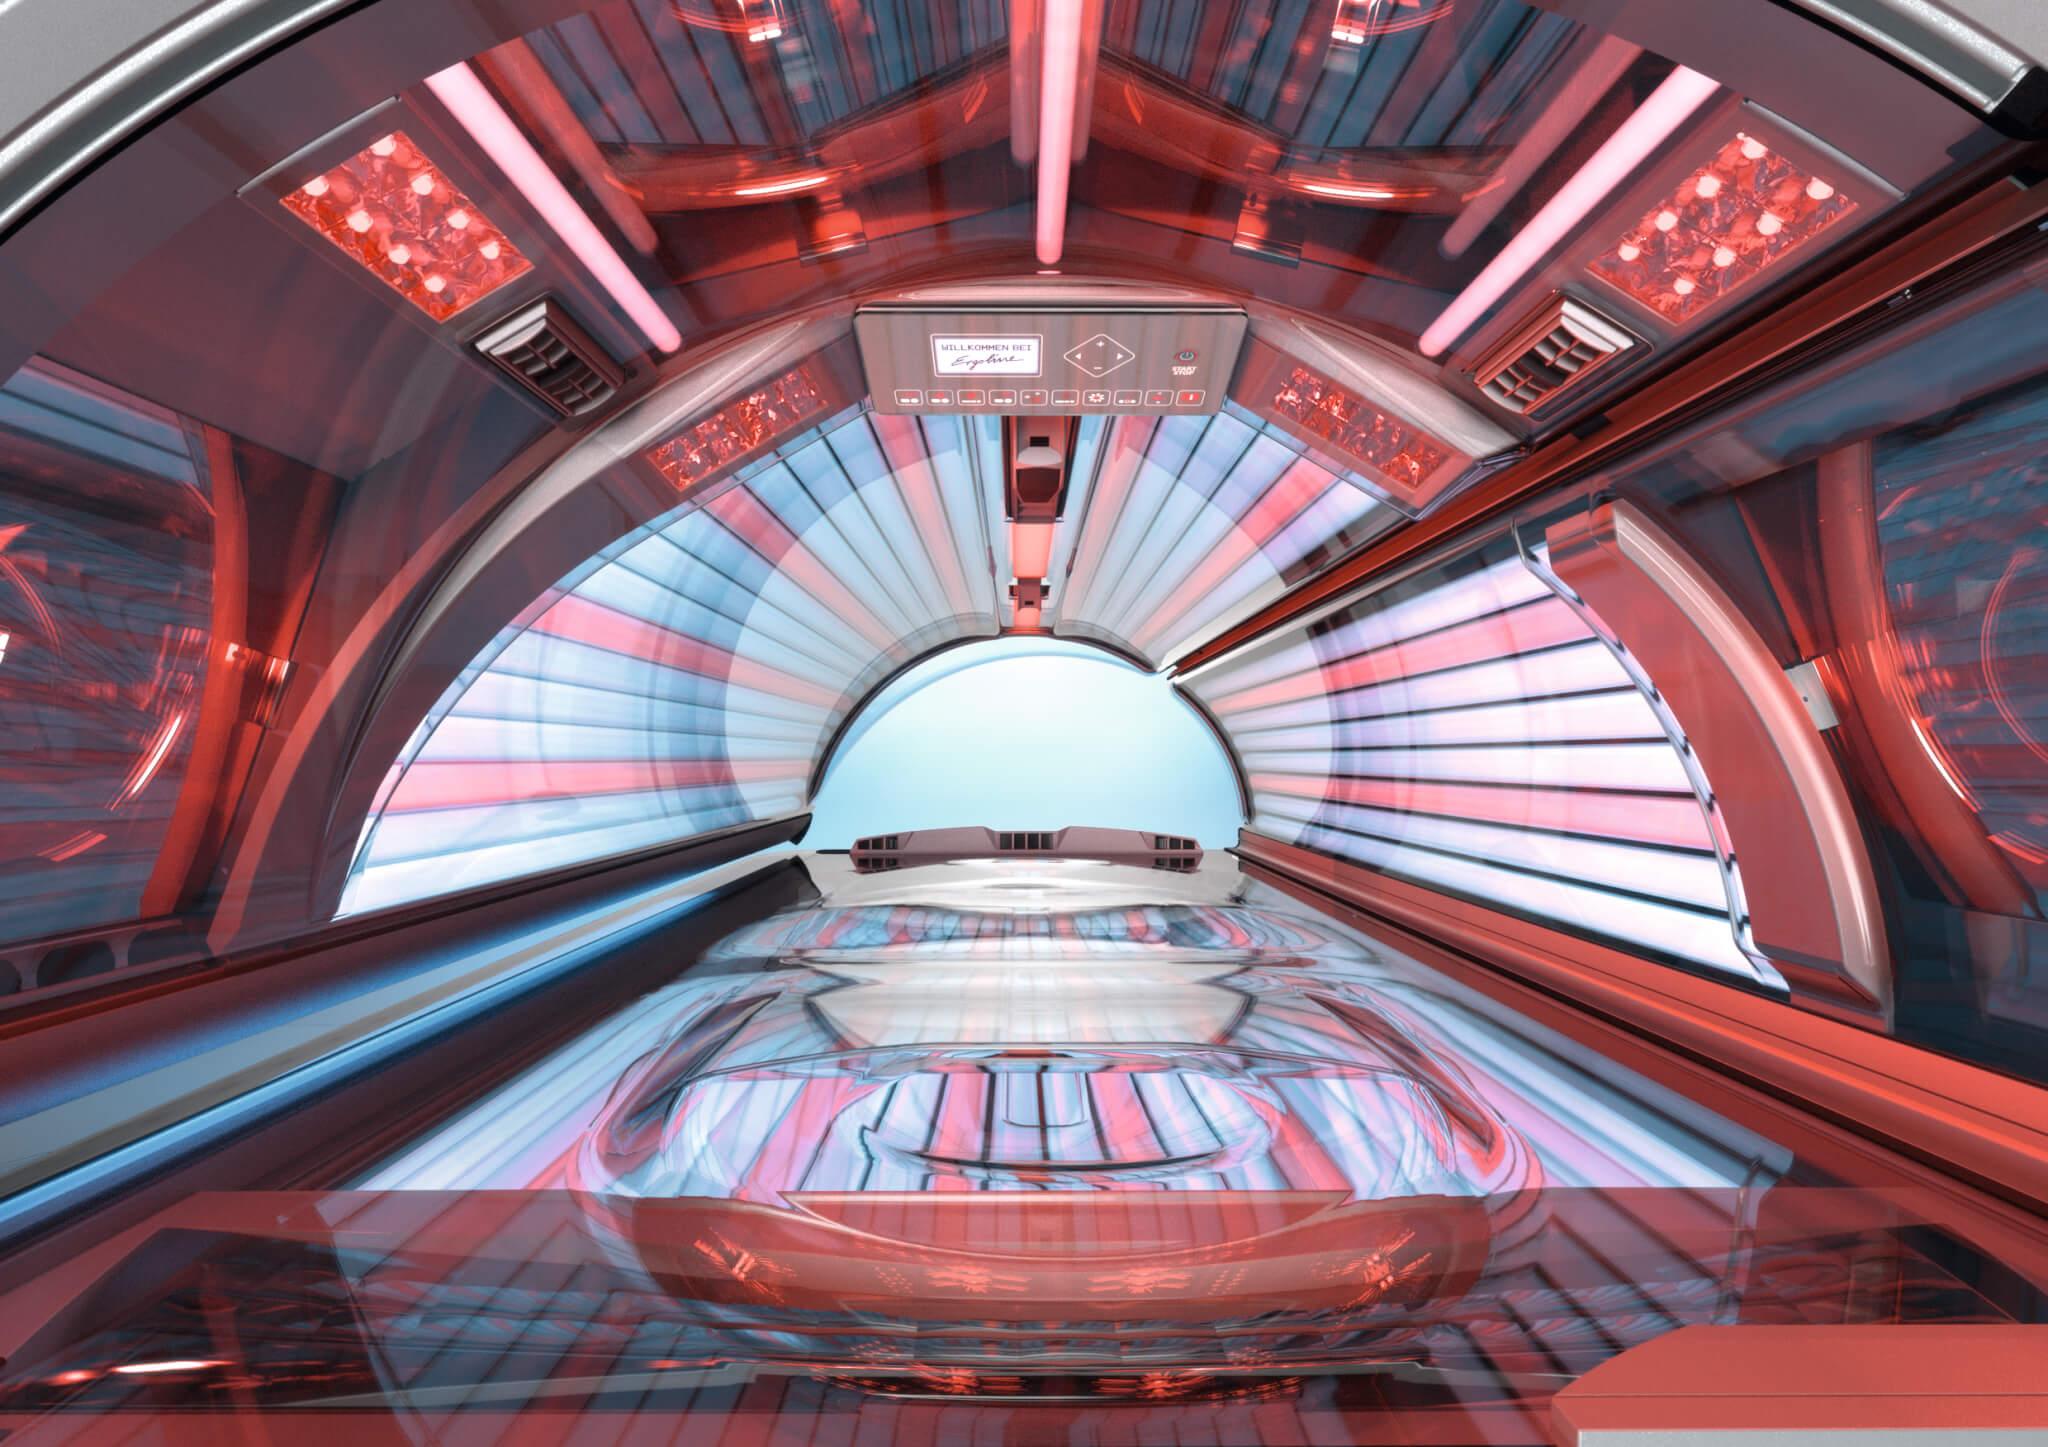 rz-p1600_slp-shot05-tunnelblick_gerade-blau_rot_300dpi_CMYK